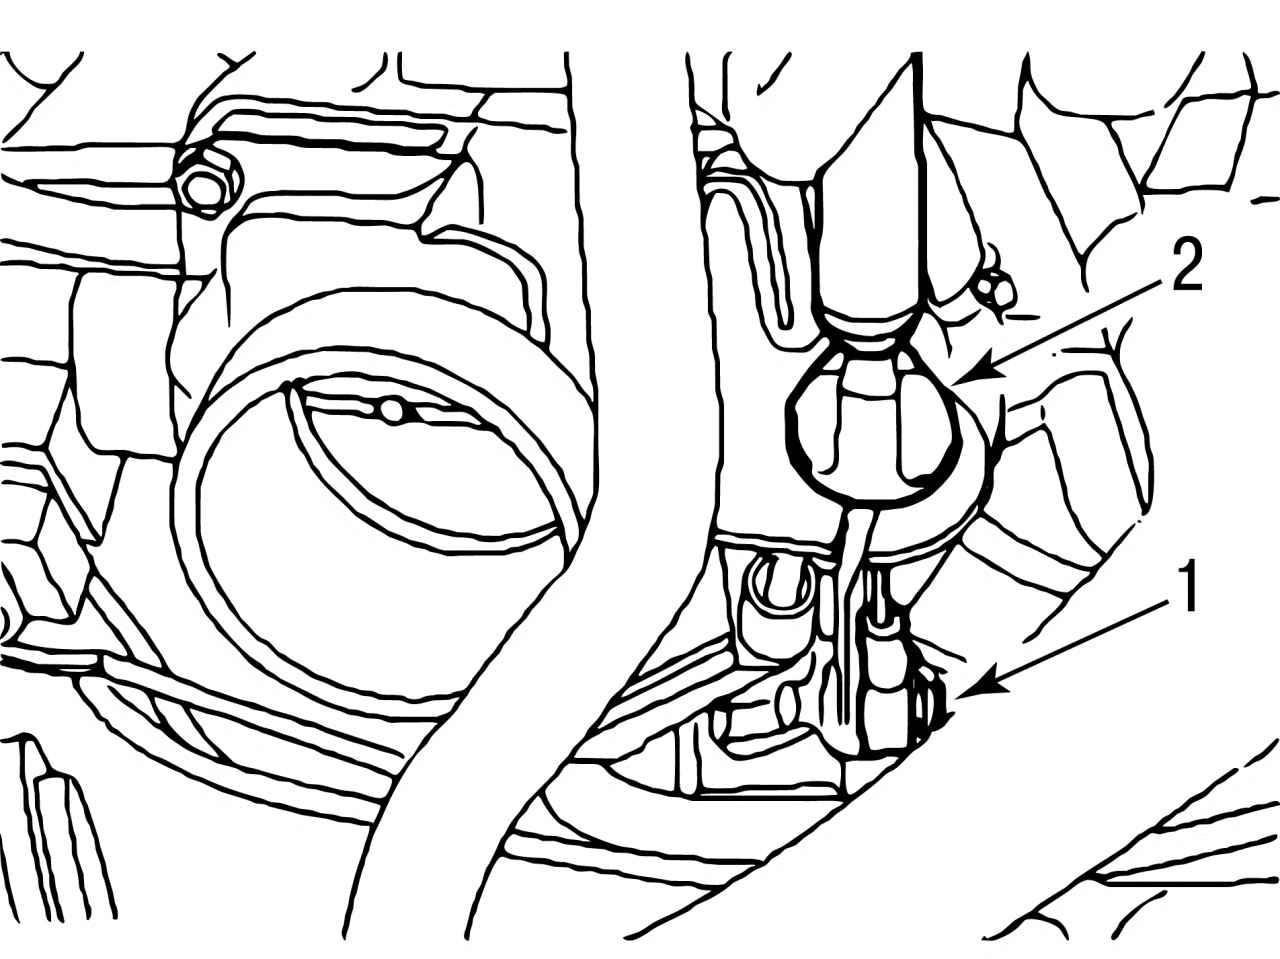 Ремонт концевика крышки багажника форд фокус 2 1 фотография